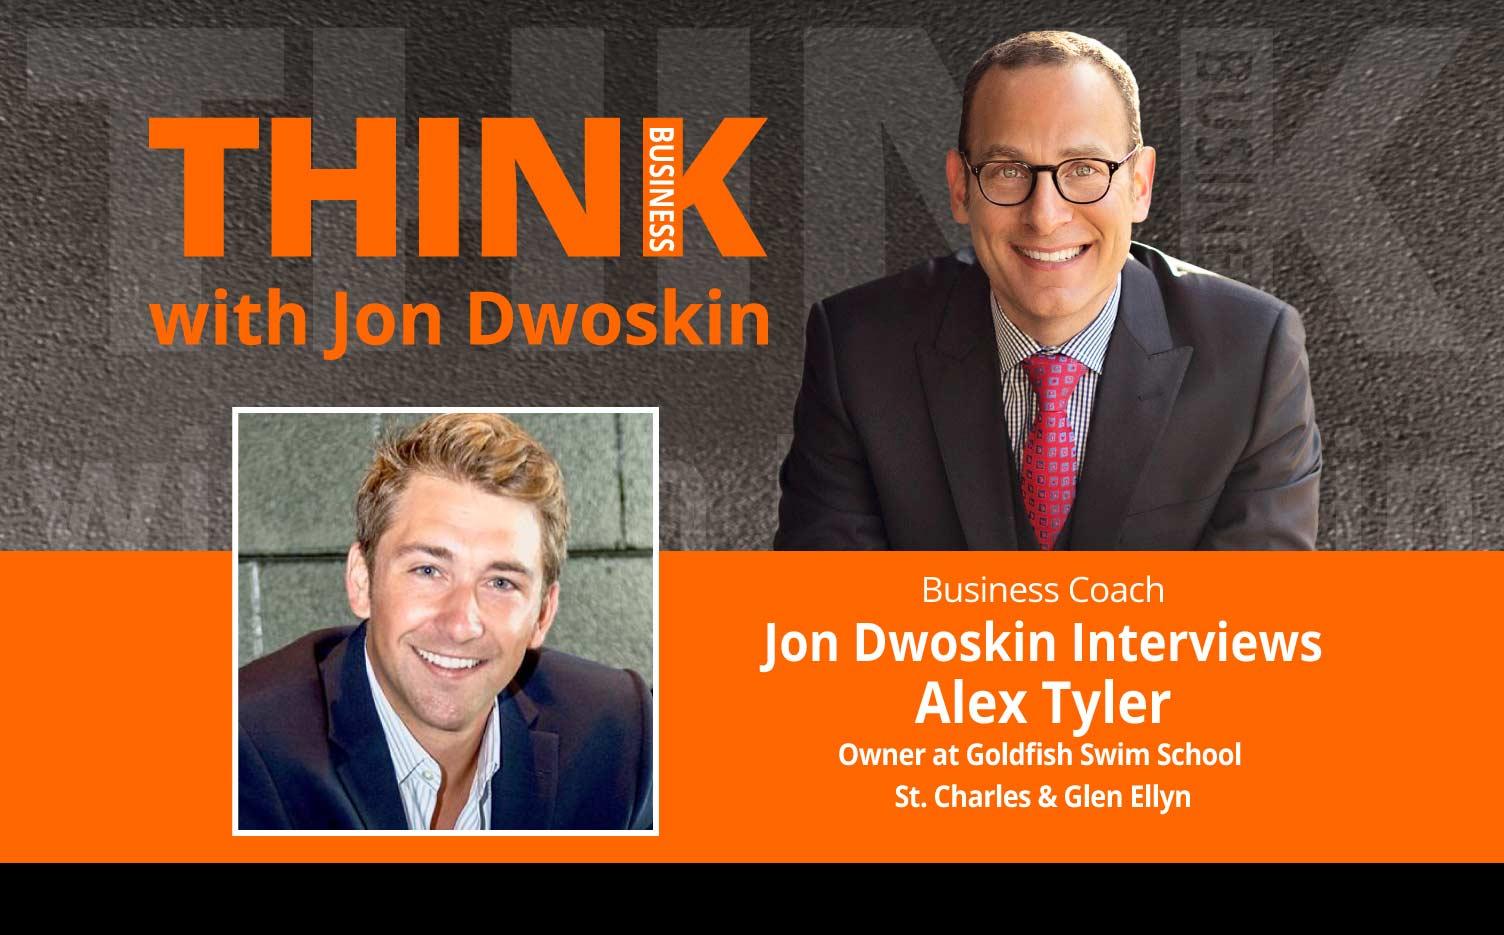 THINK Business Podcast: Jon Dwoskin Interviews Alex Tyler, Owner at Goldfish Swim School - St. Charles & Glen Ellyn